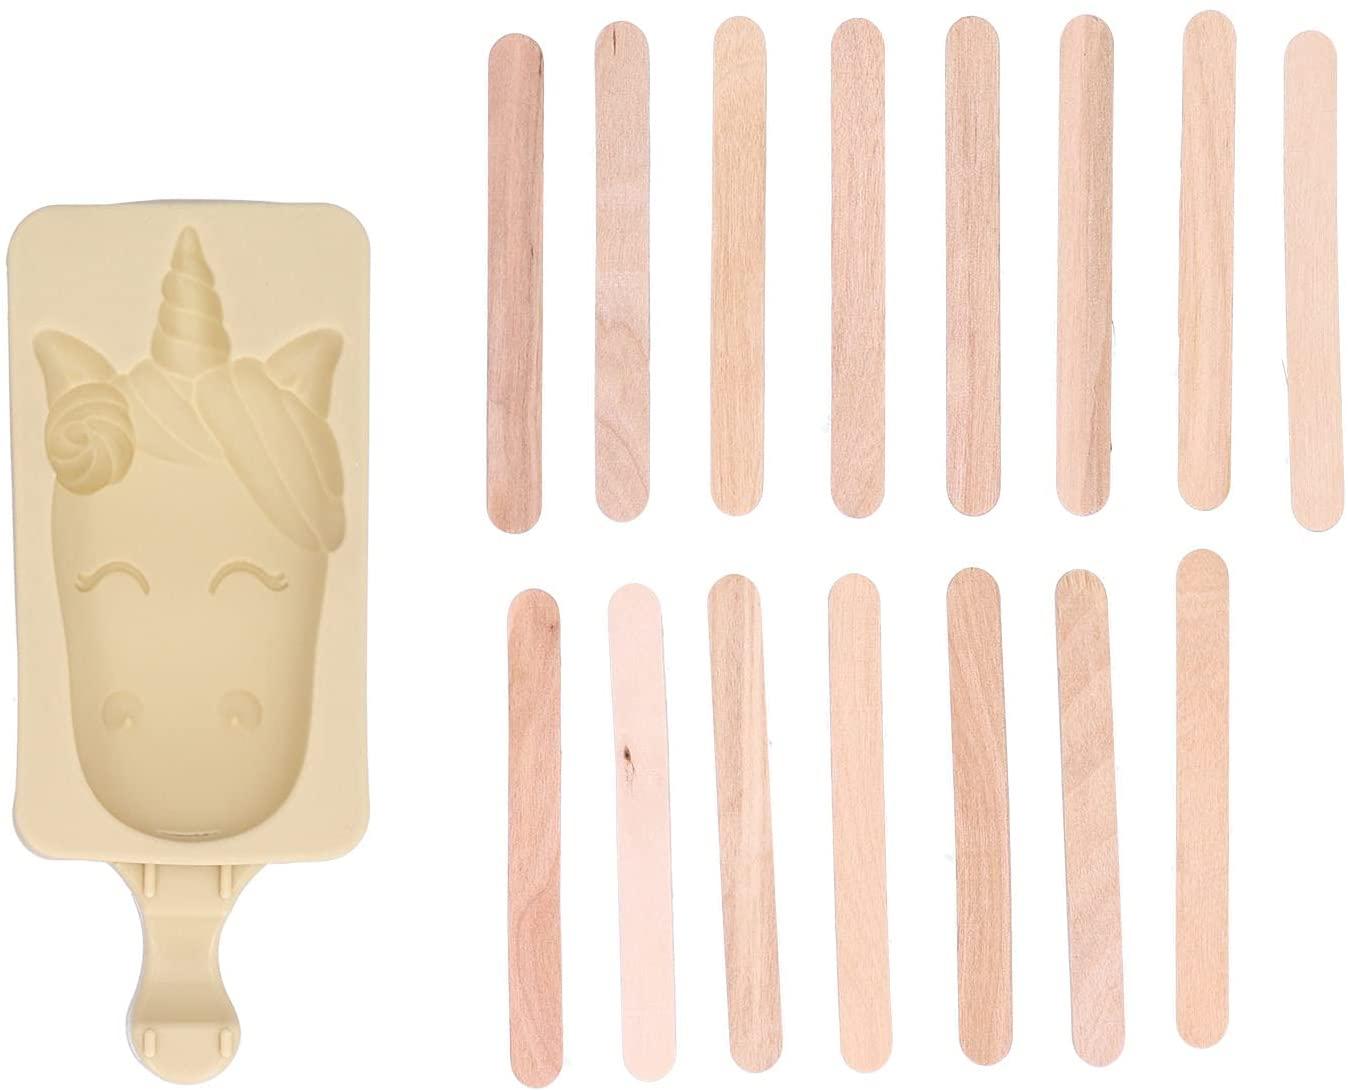 Unicorn Silicone Popsicle Mould